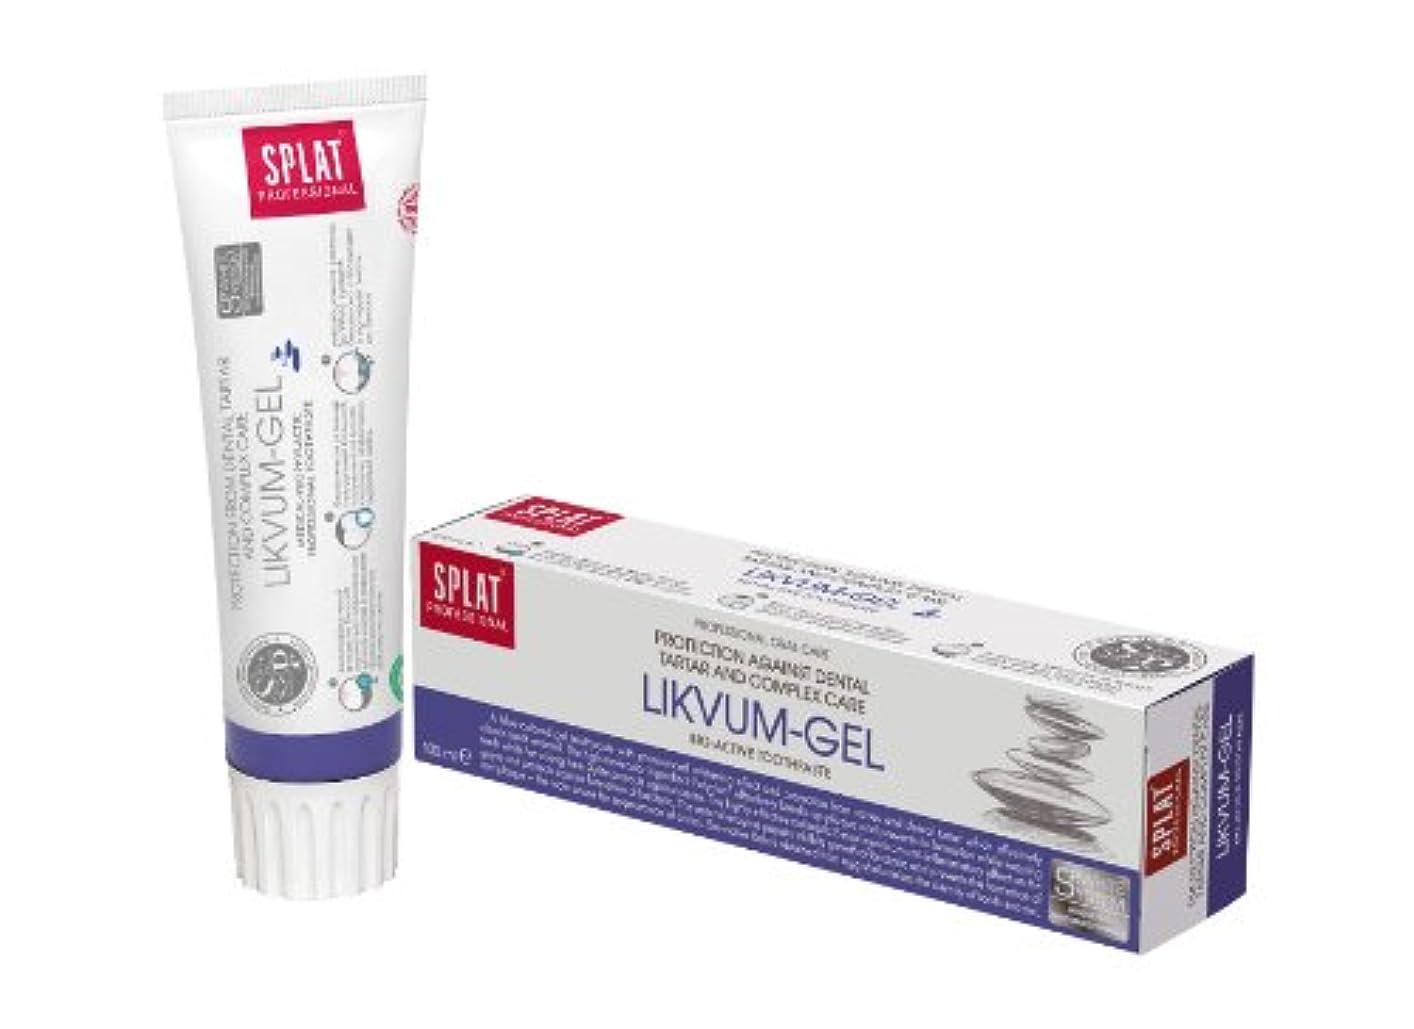 Toothpaste Splat Professional 100ml (Likvum-gel)